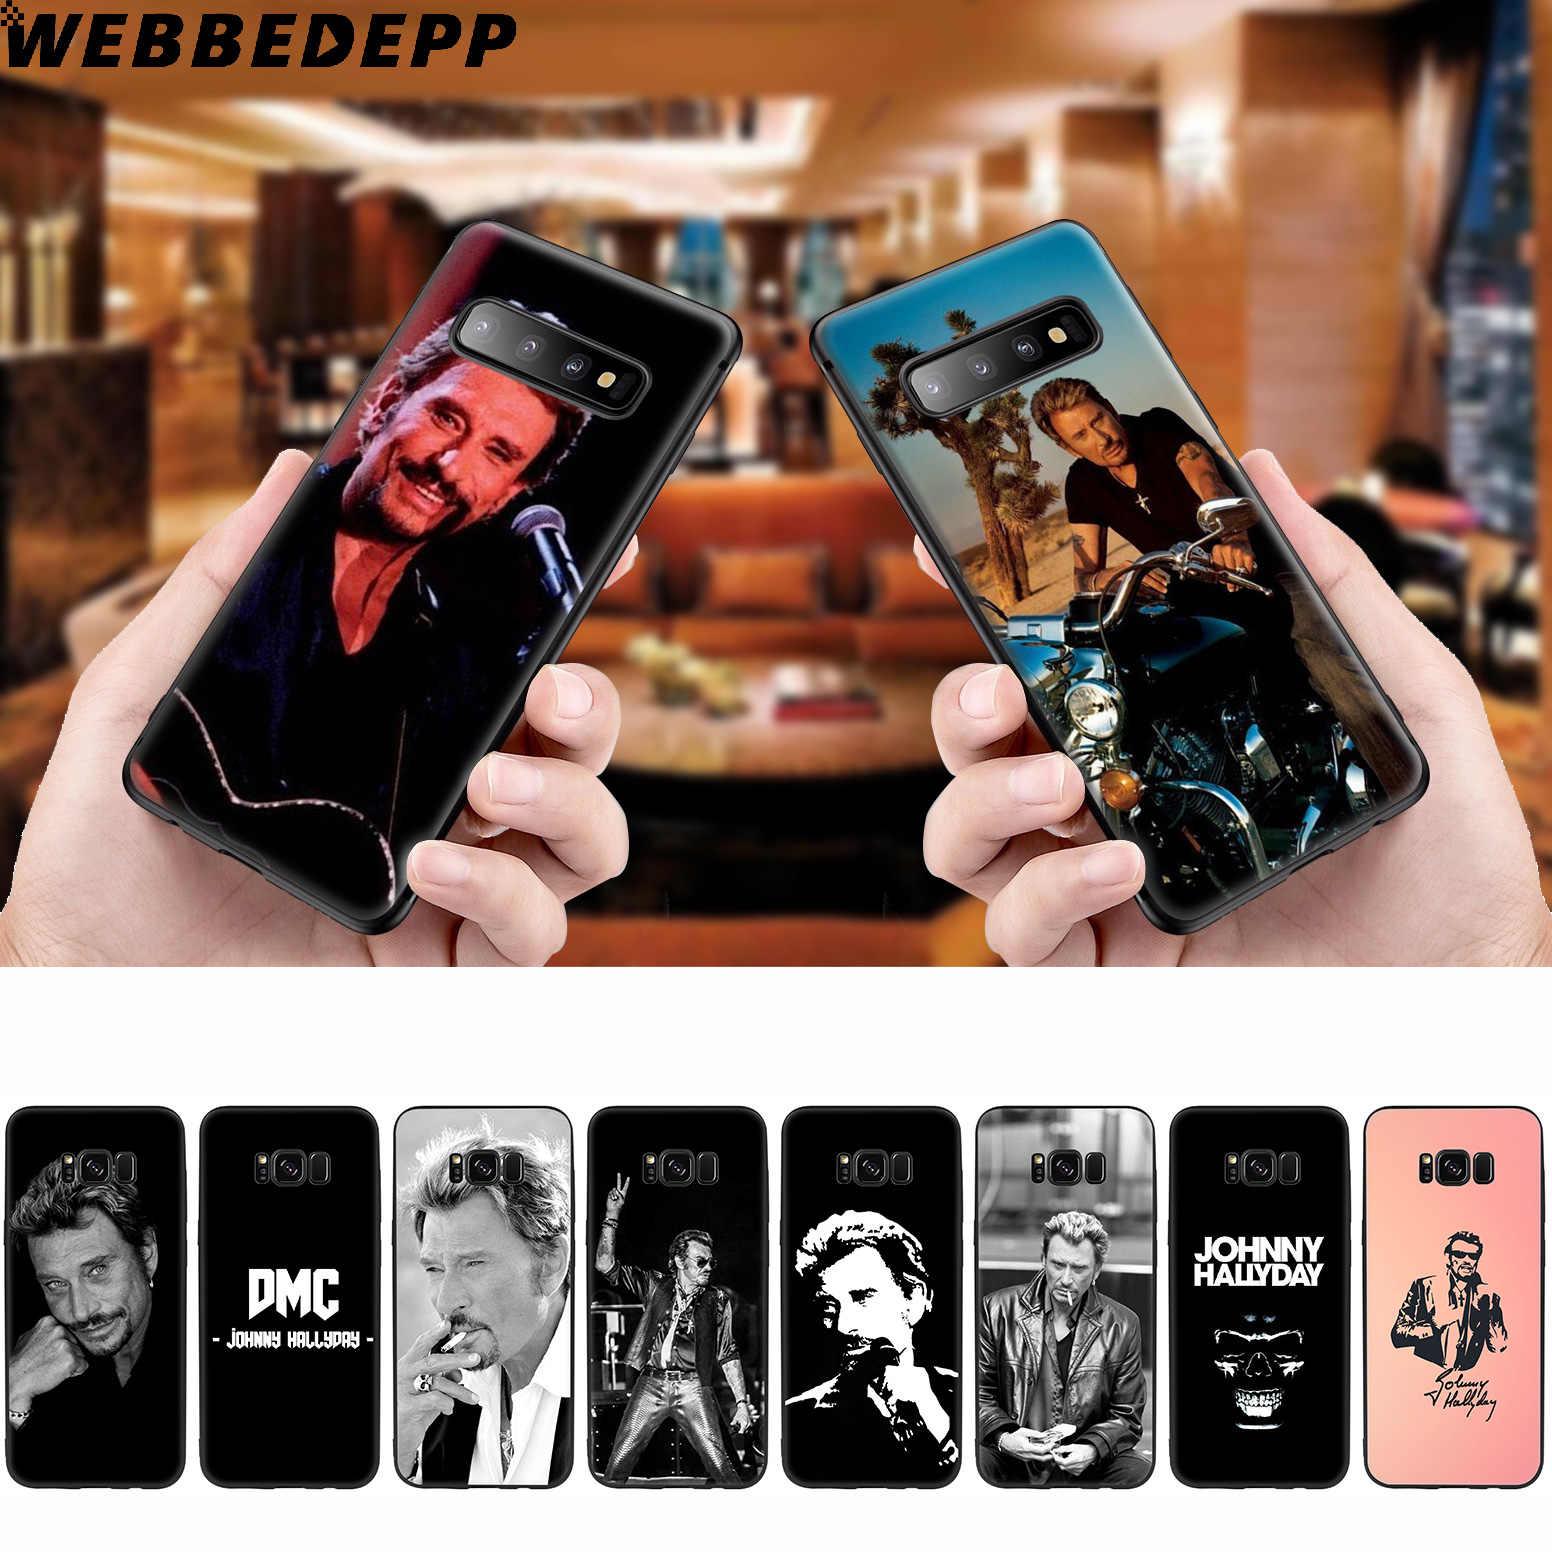 WEBBEDEPP ジョニー Hallyday サムスンギャラクシー S10 S10e S9 S8 プラス S7 S6 エッジ S9 プラス & J6 2018 注 10 プラス 9 8